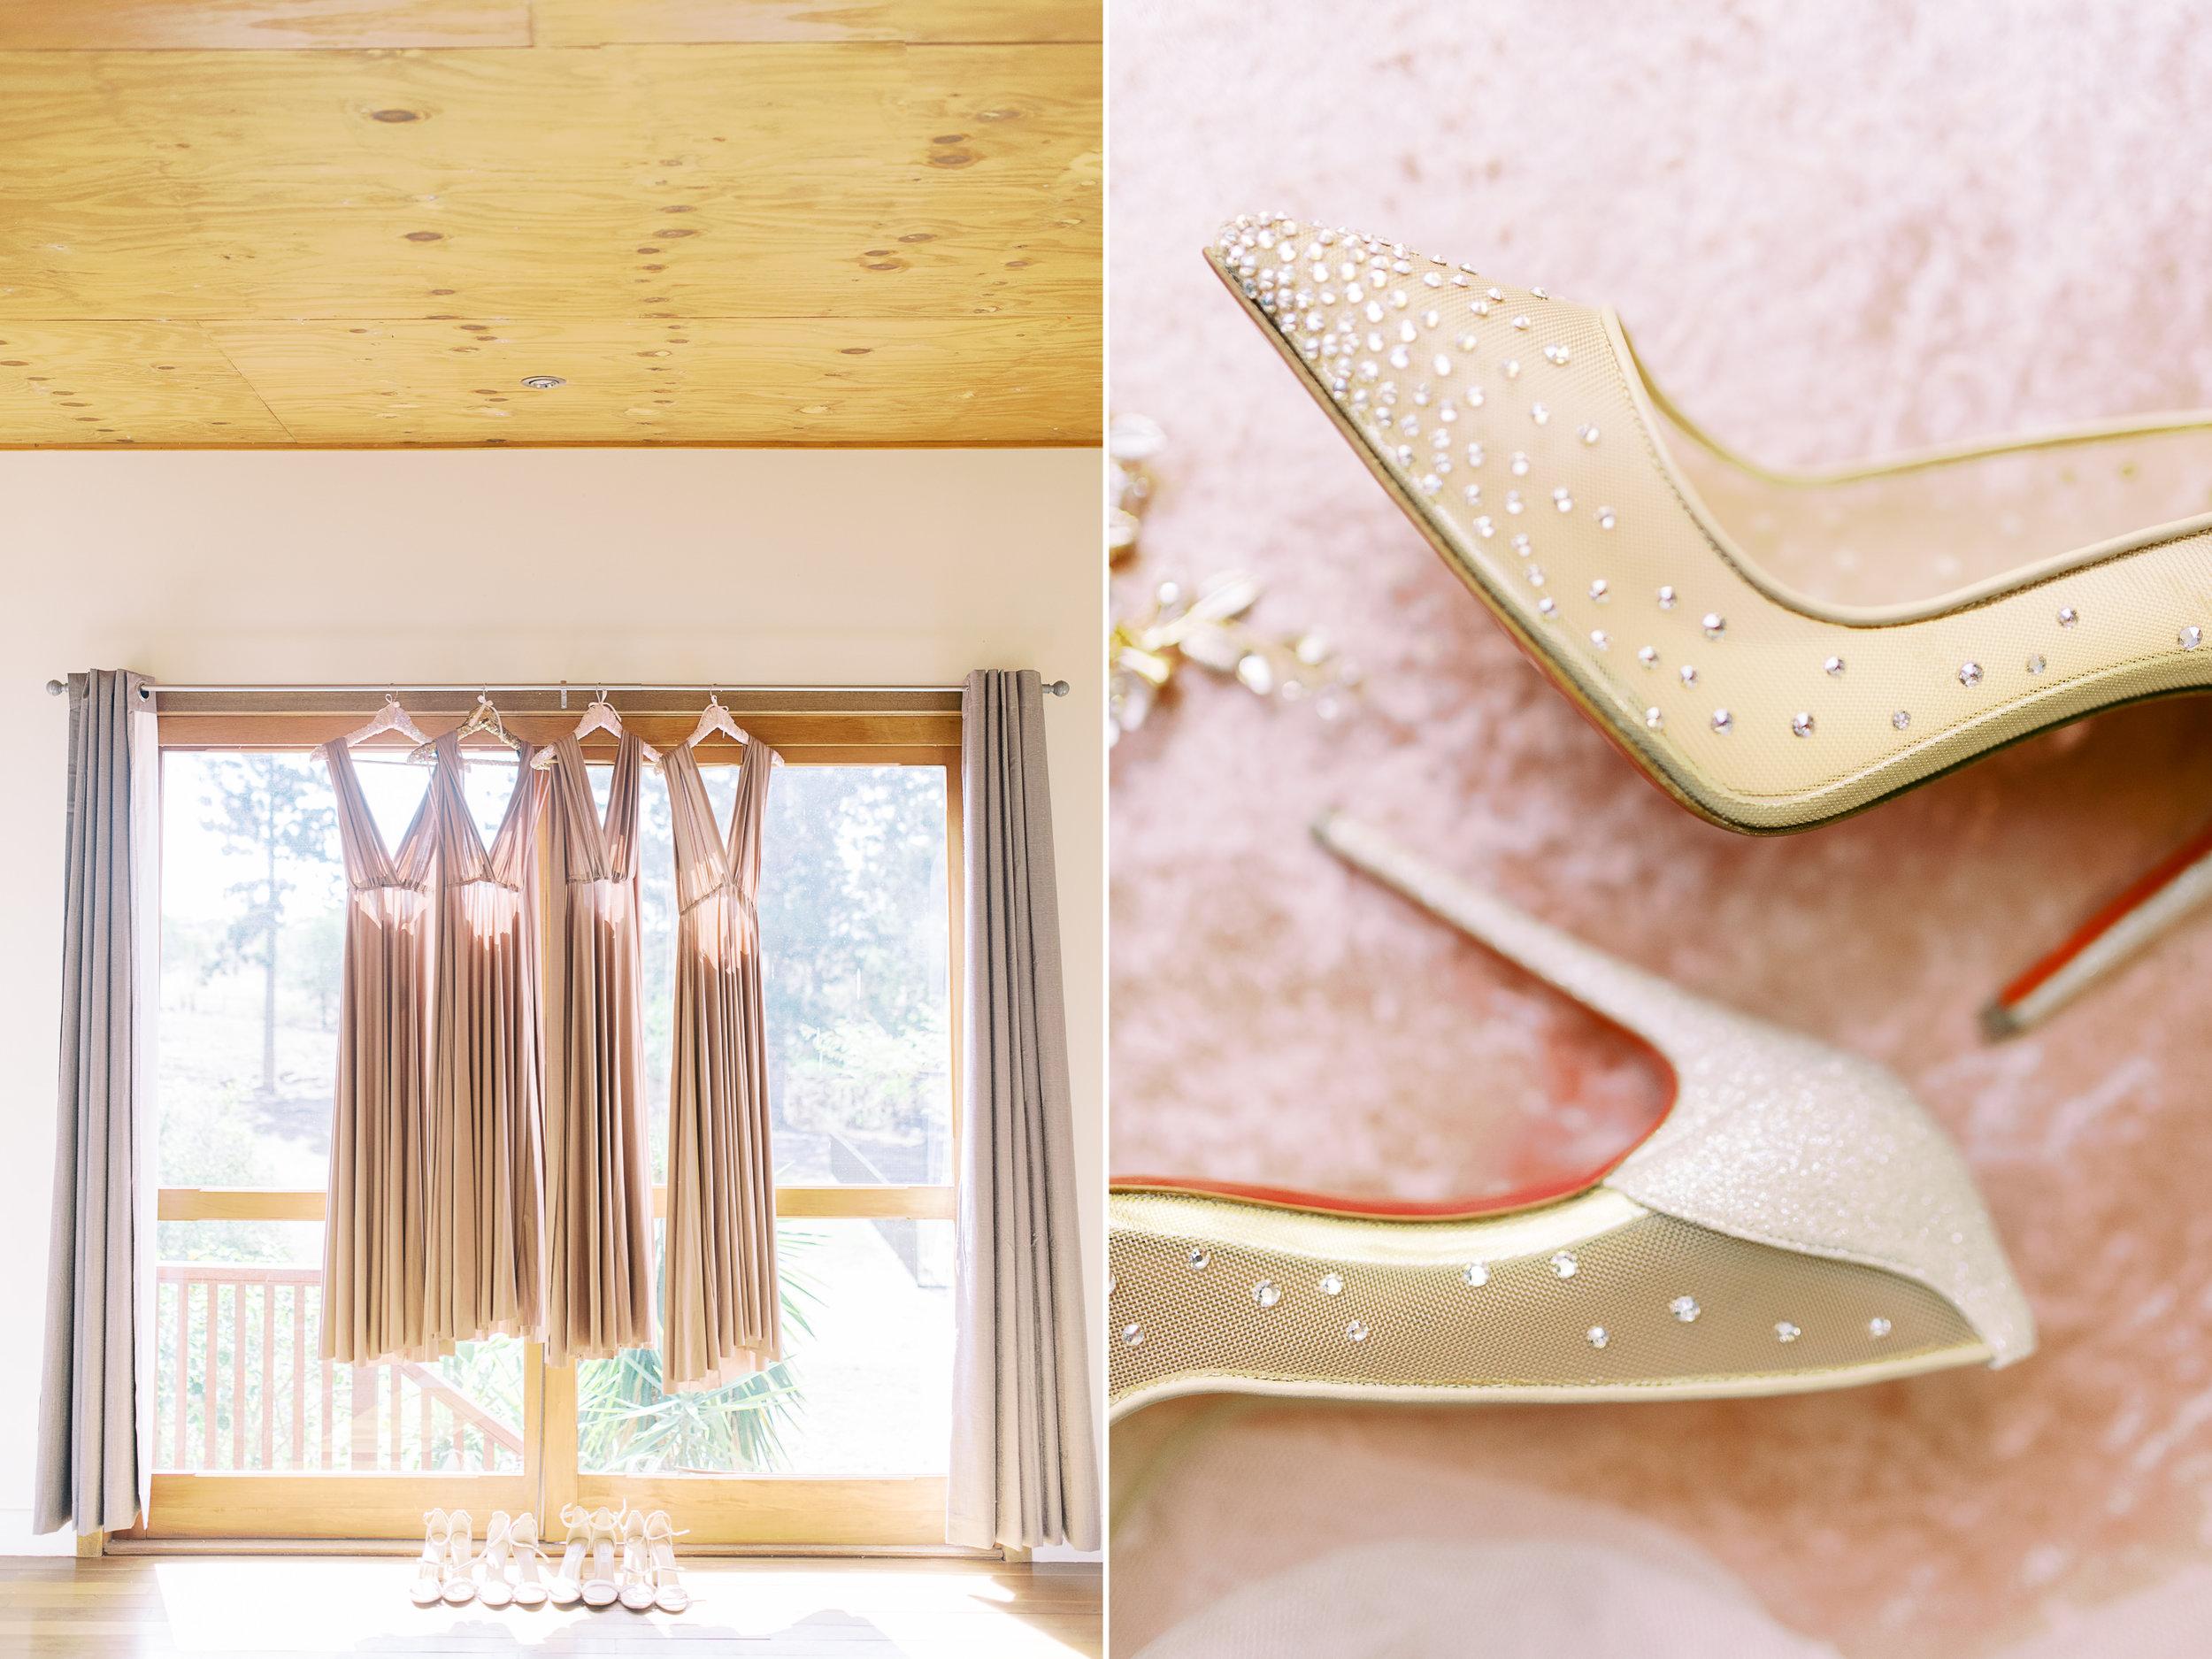 kooroomba-lavendar-farm-film-photography-wedding-photography-romantic-01.jpg